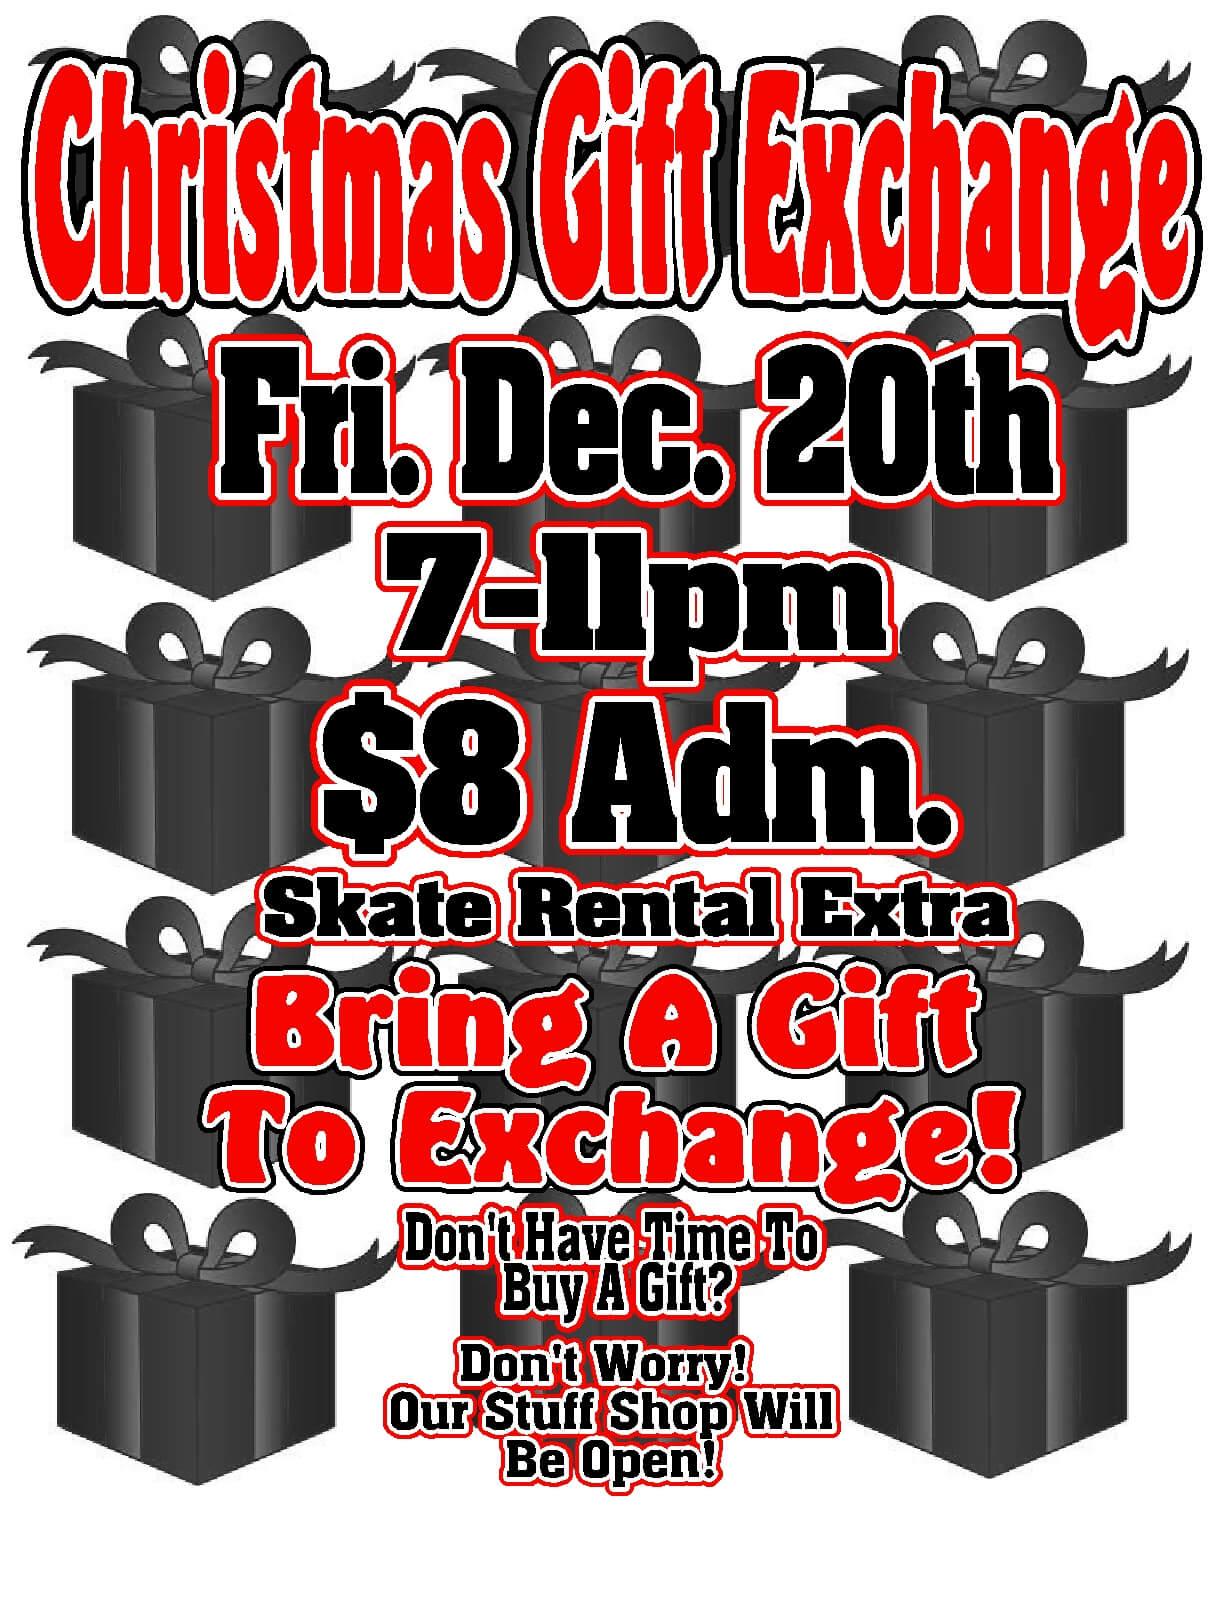 Christmas gift exchange Dec 2013